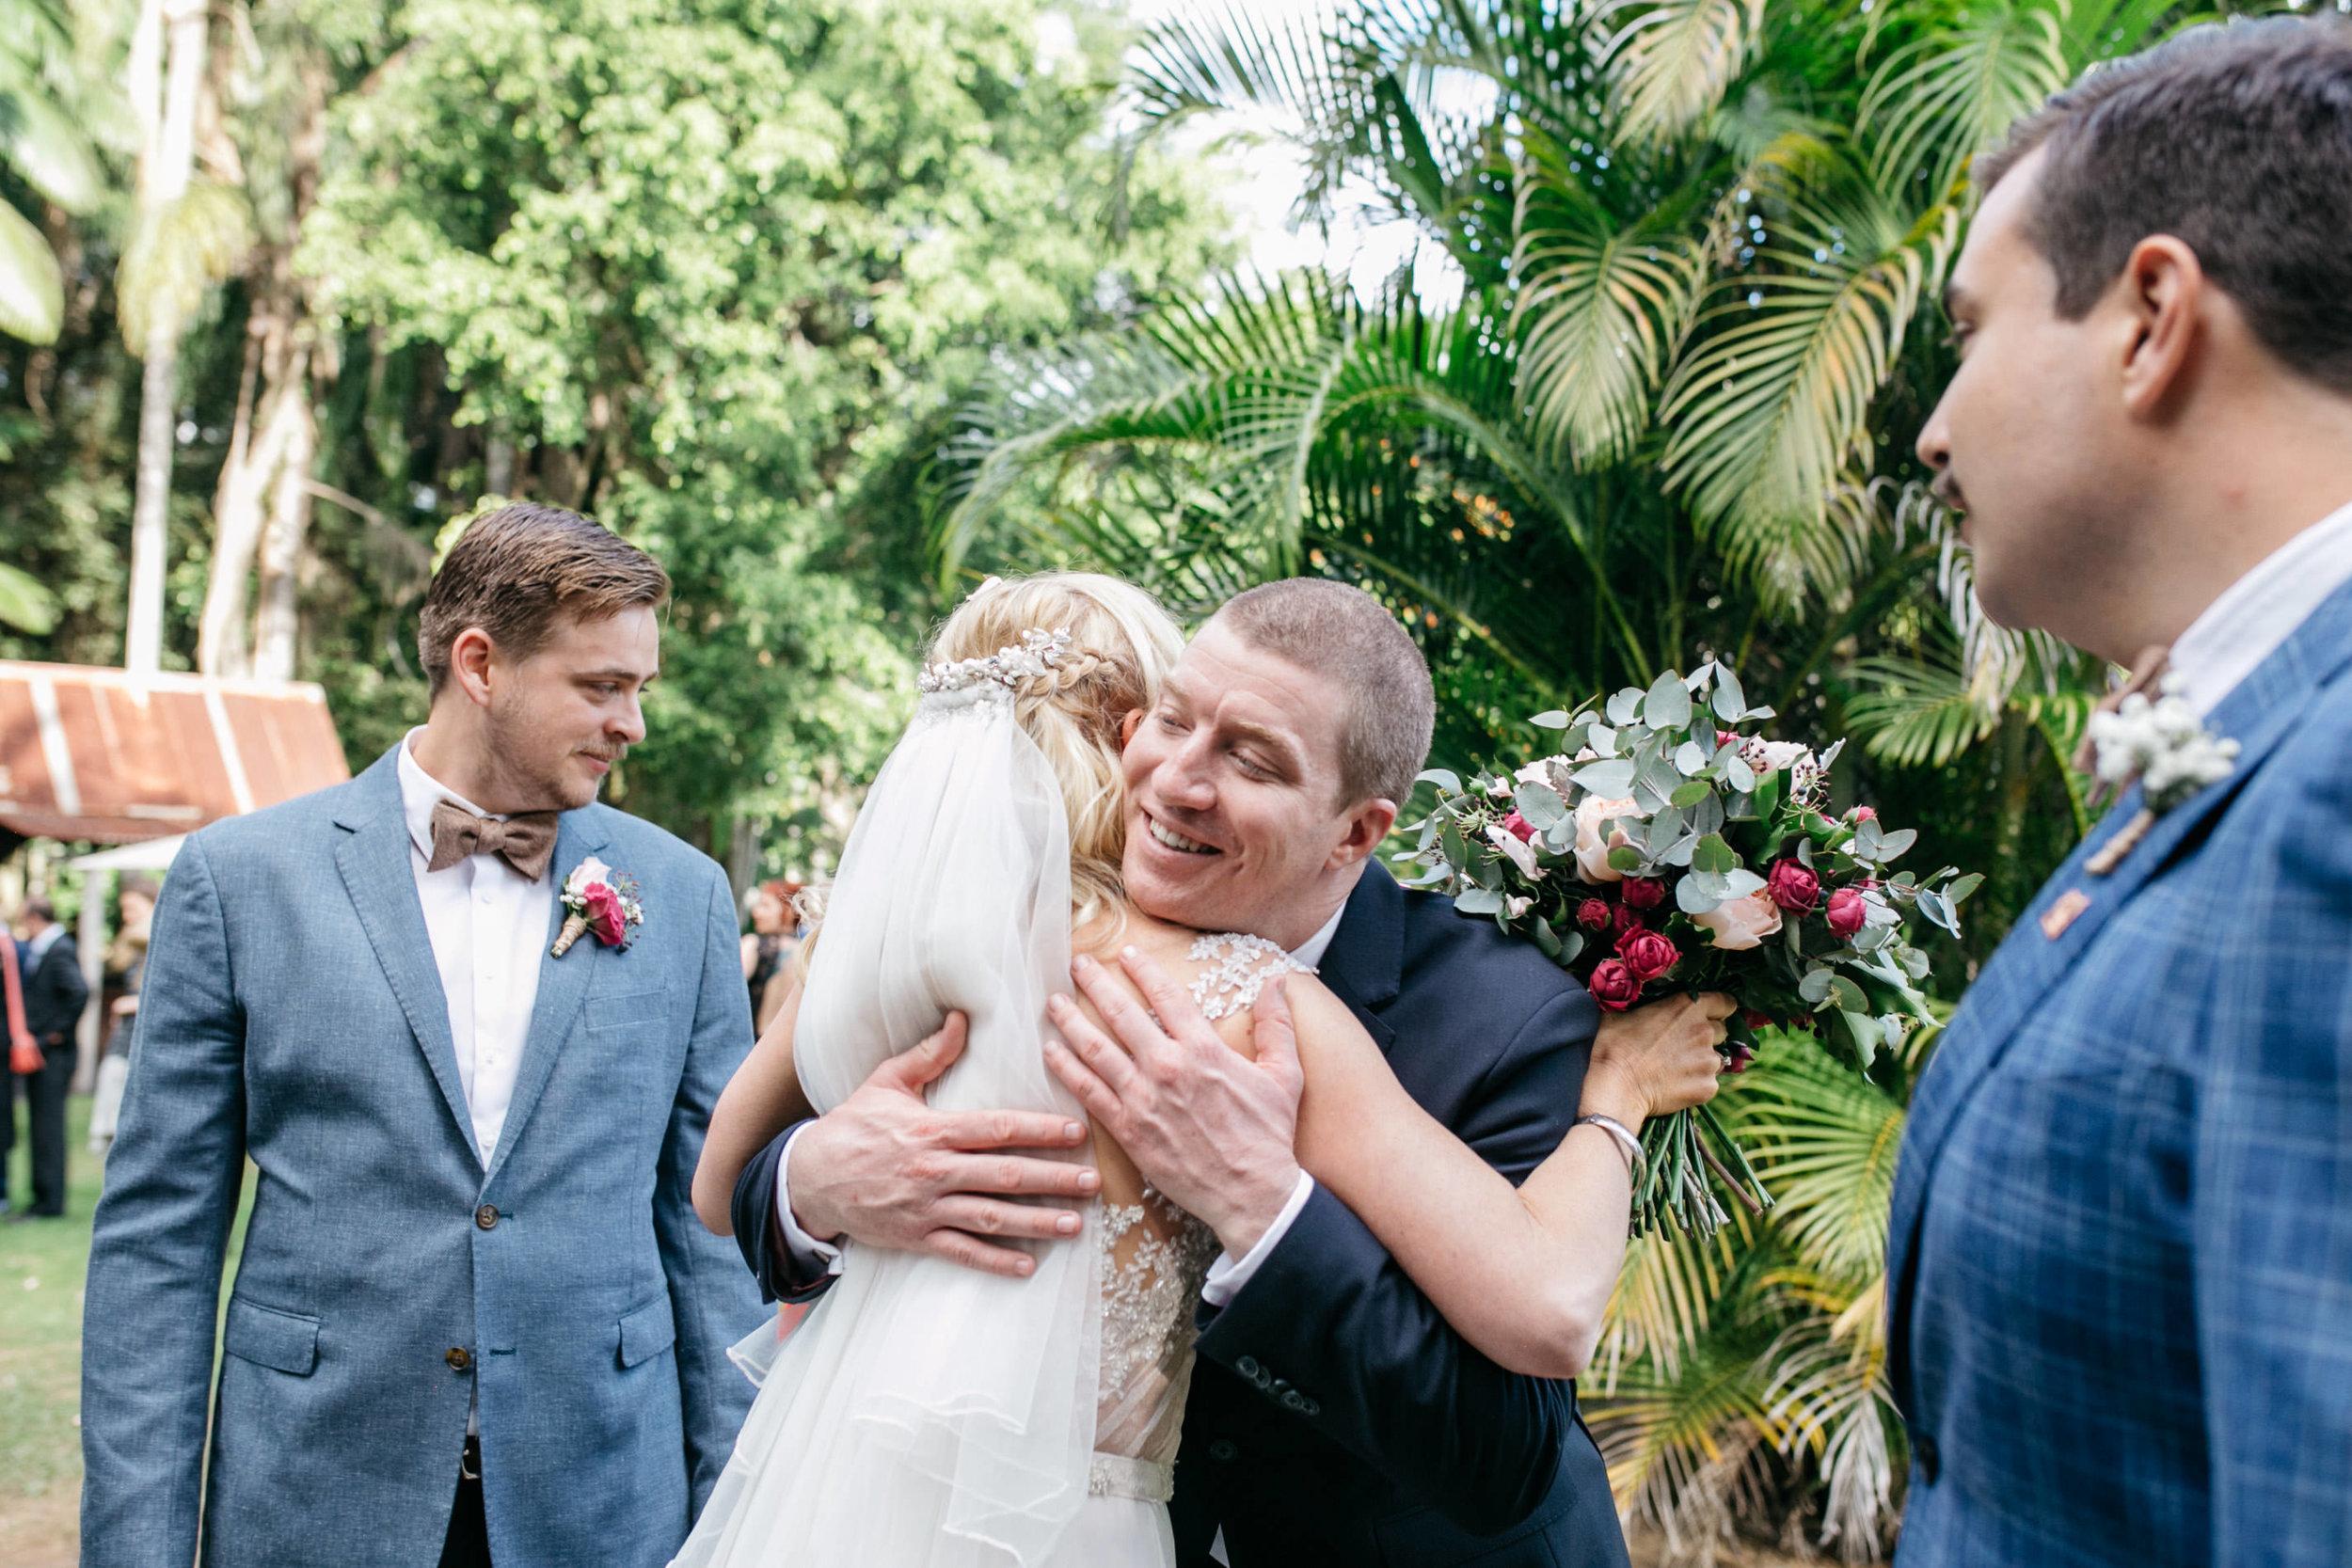 True North Photography_Boomerang Farm_Stacey and Isaac_Gold Coast Wedding_Barm Wedding_Hinterland Wedding-115.jpg